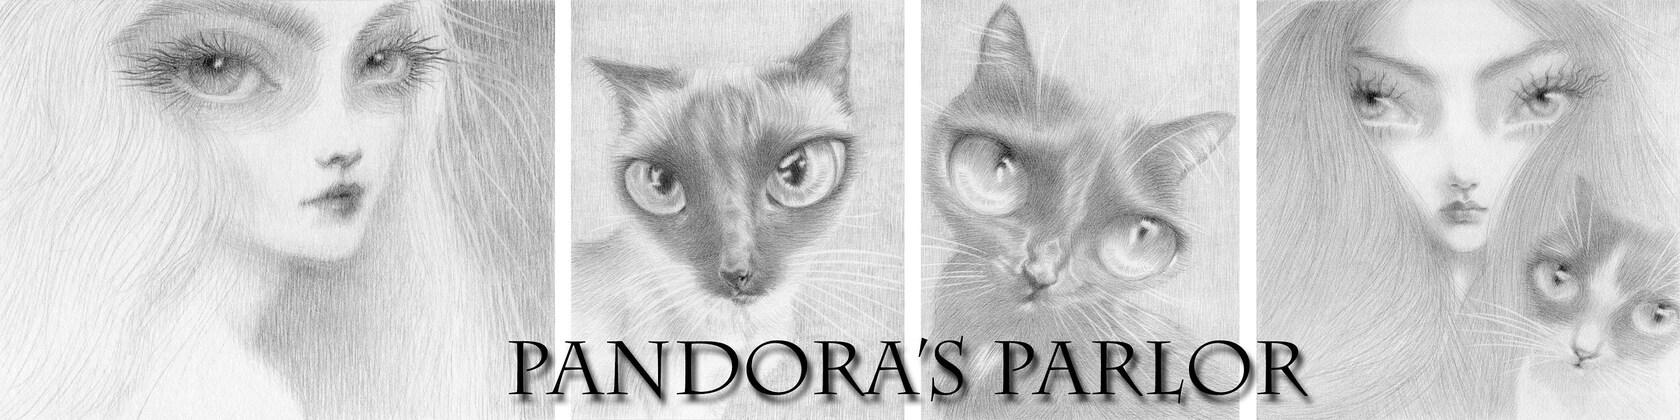 Black Cat Art By Diane Irvine Armitage By Pandorasparlor